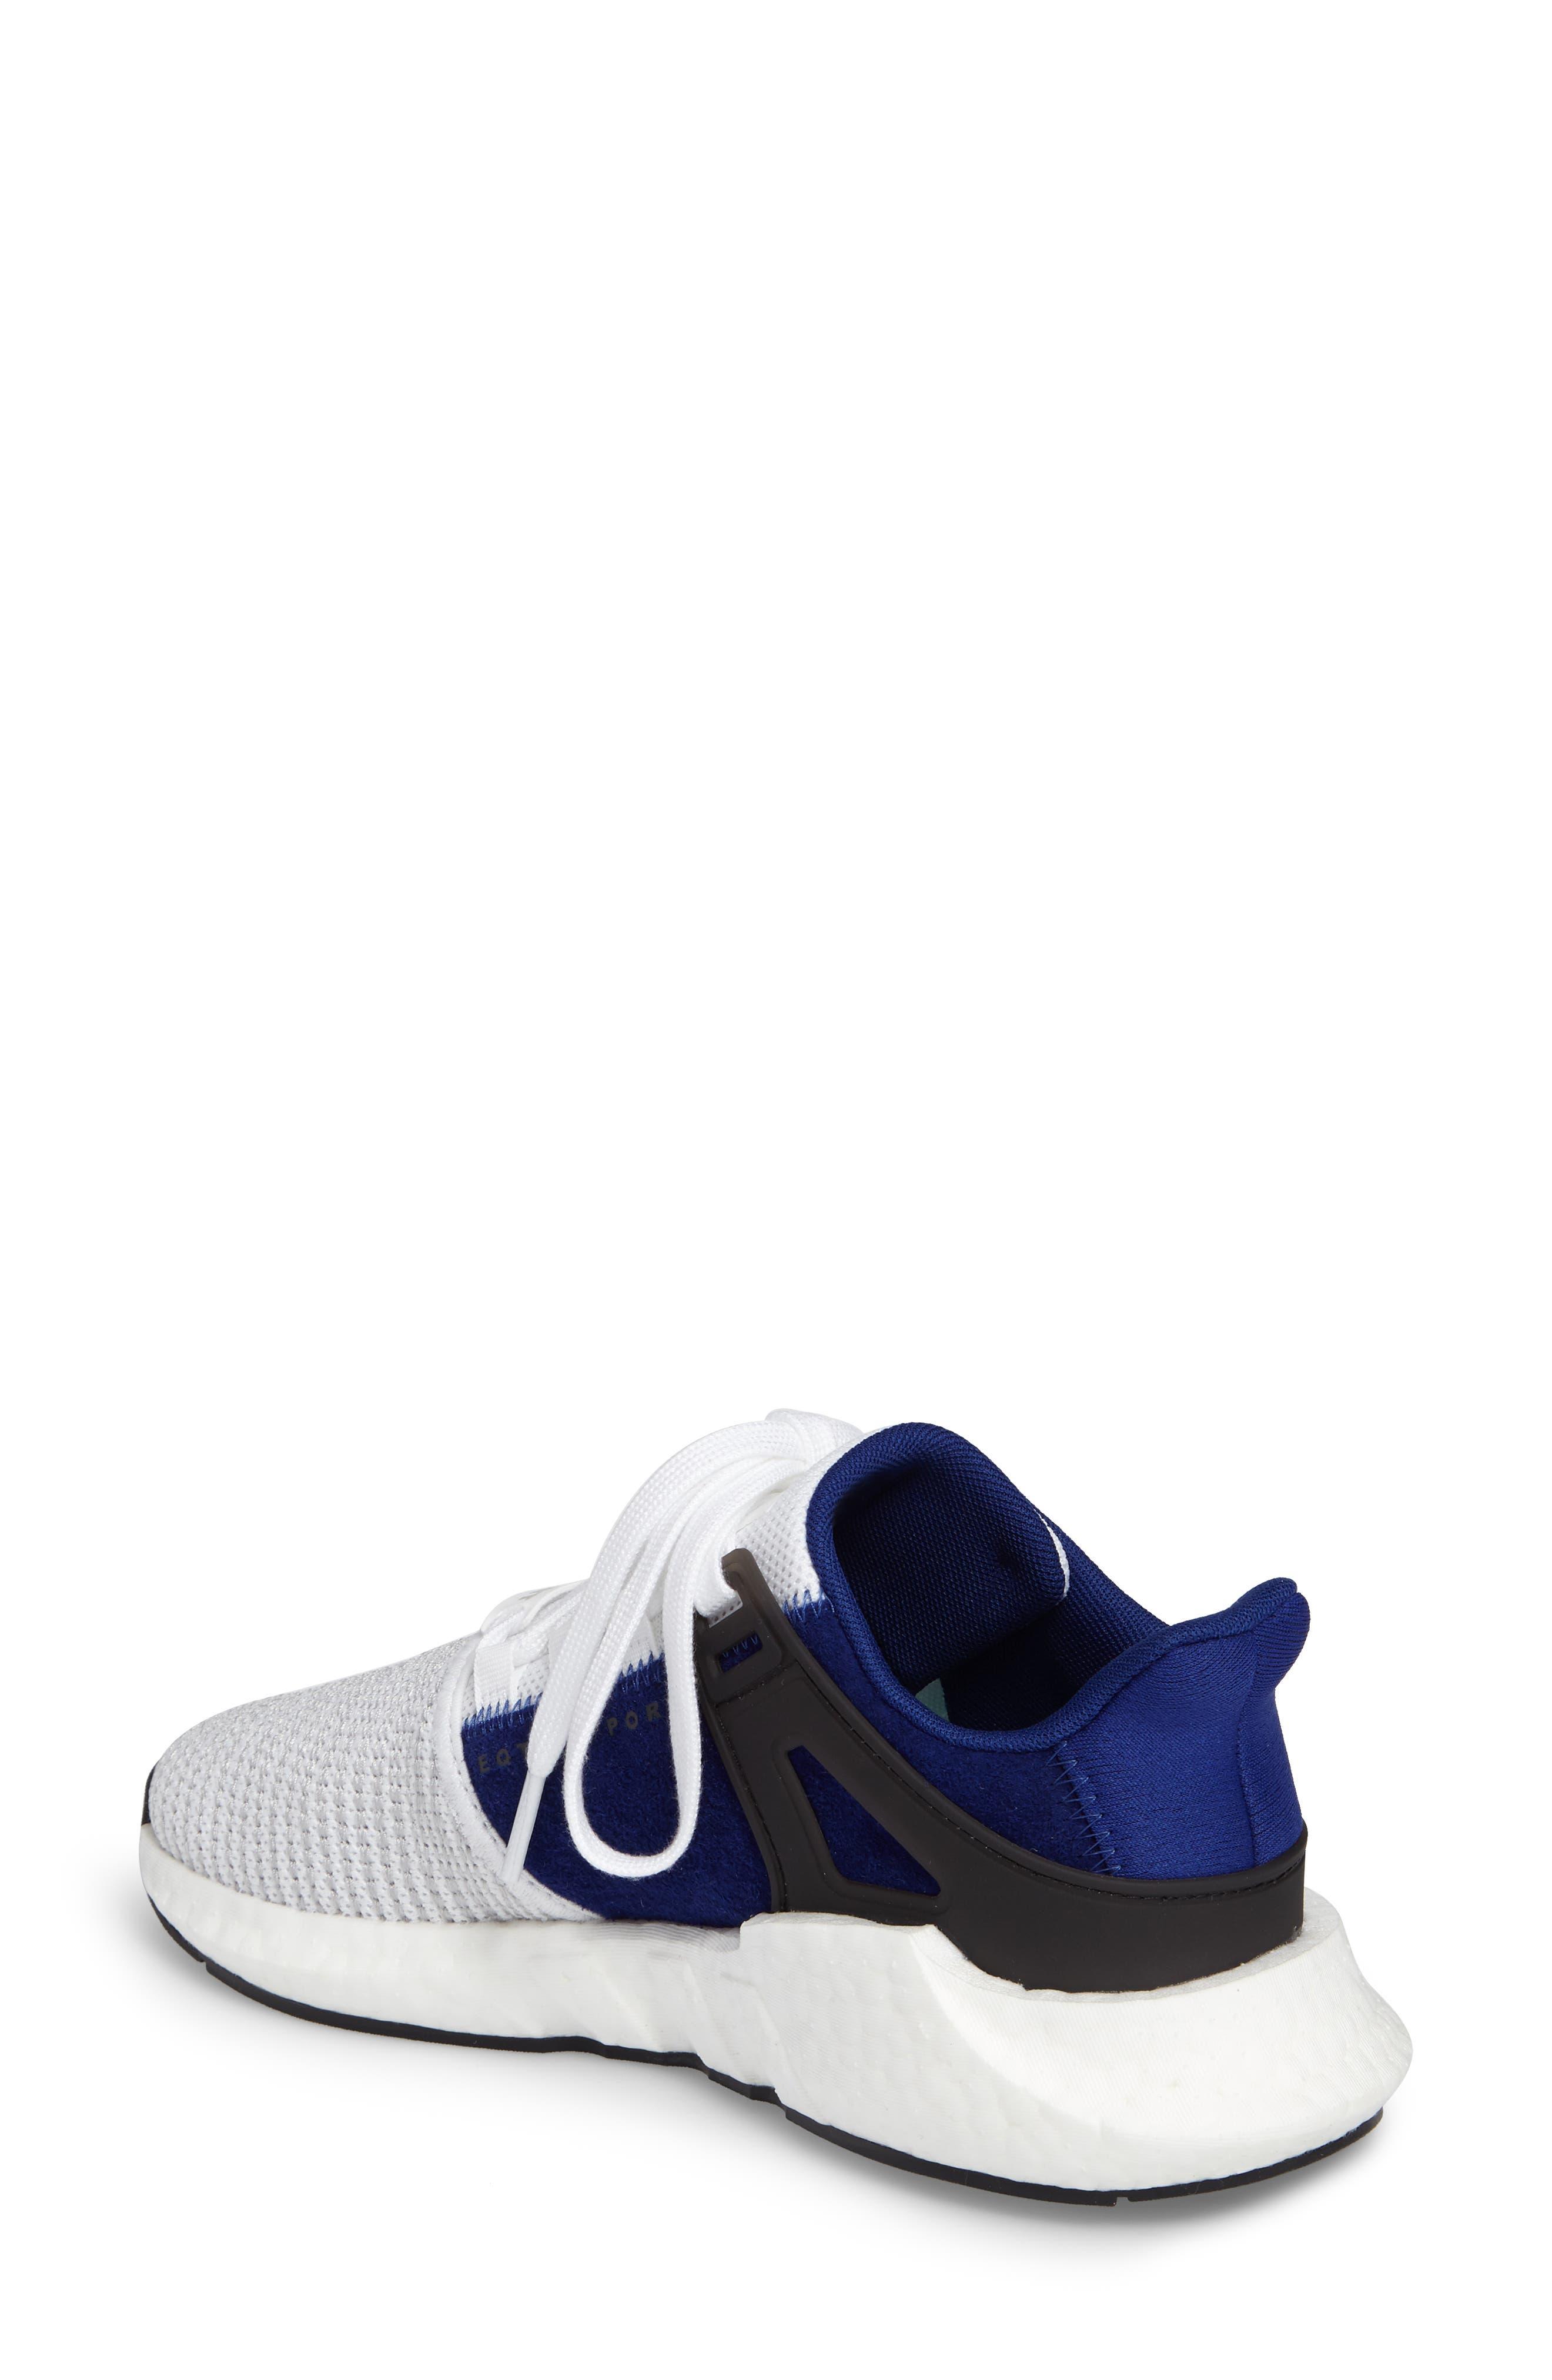 EQT Support 93/17 Sneaker,                             Alternate thumbnail 13, color,